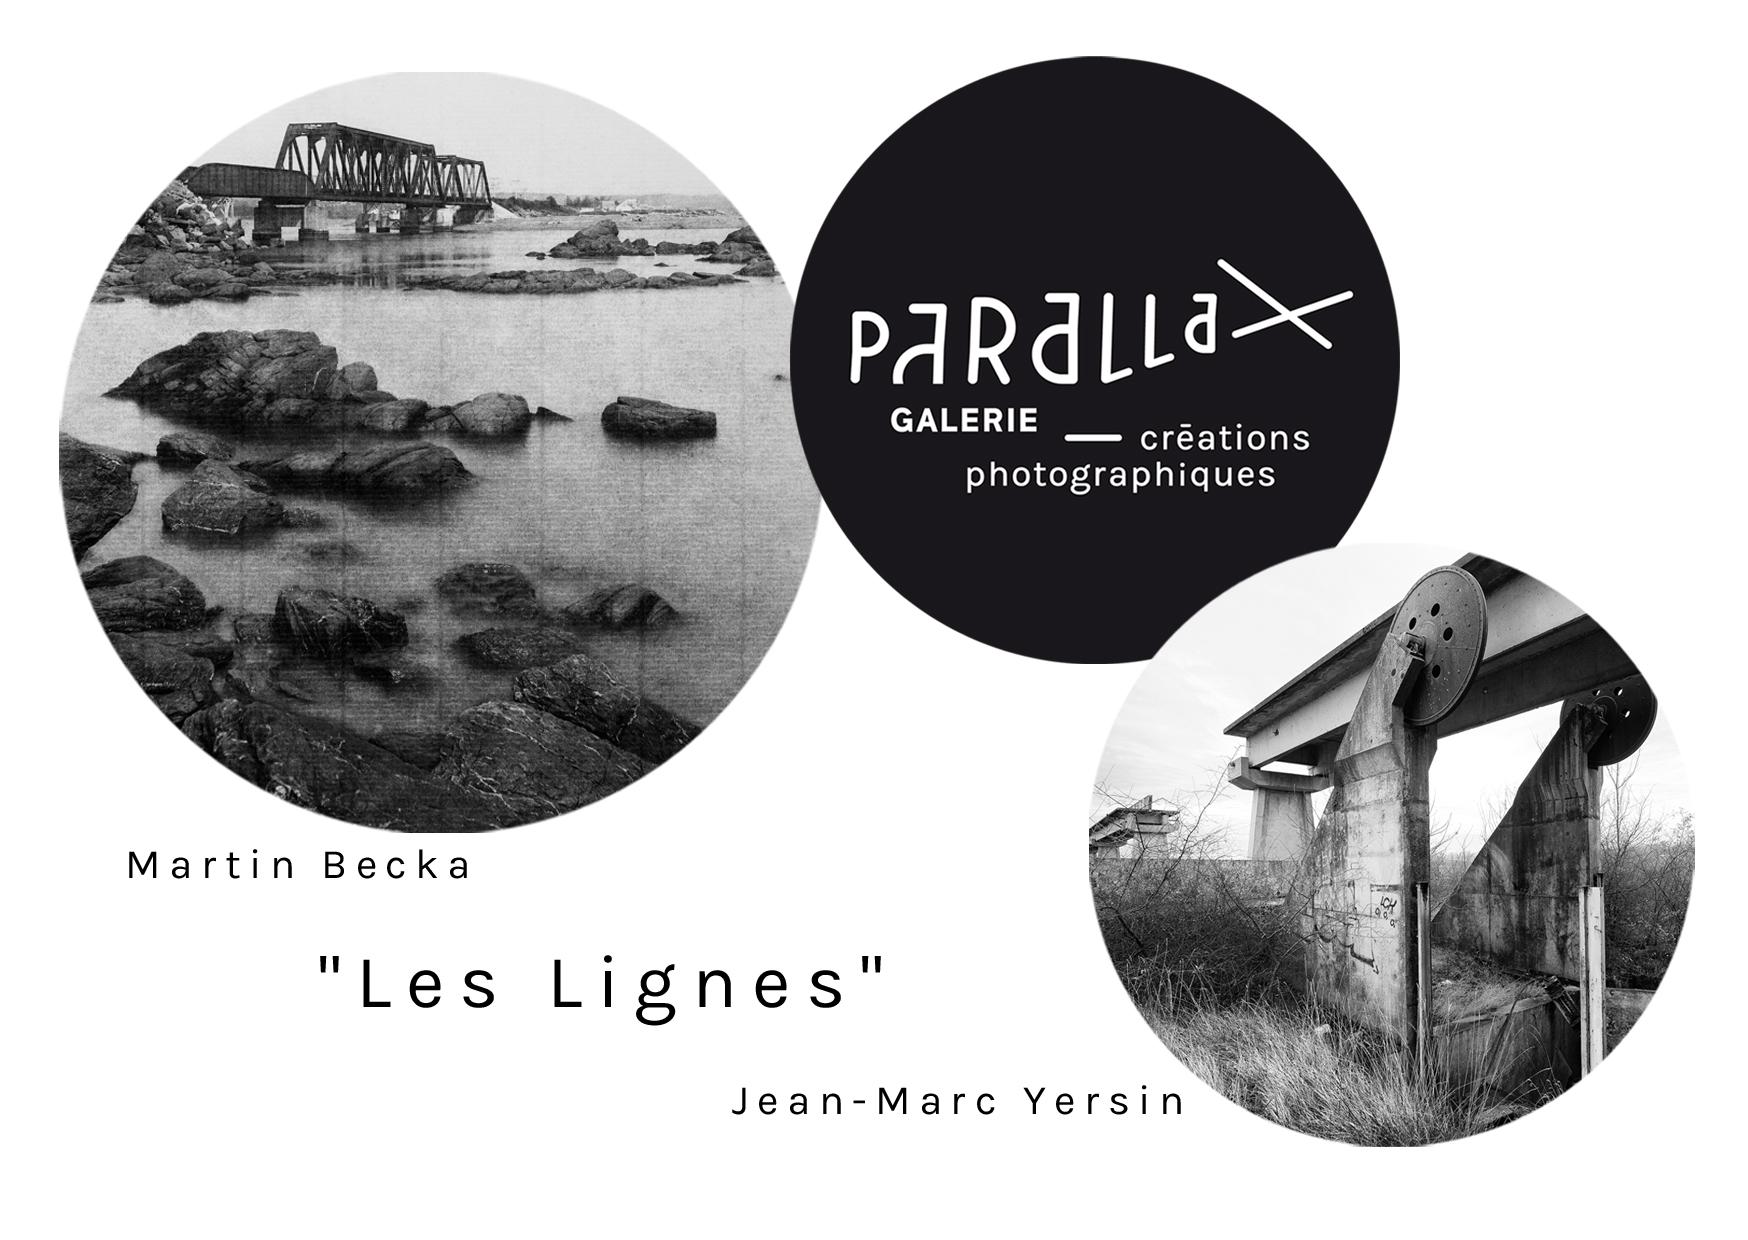 exposition, art , galerie, photographie,platinepalladium,leica